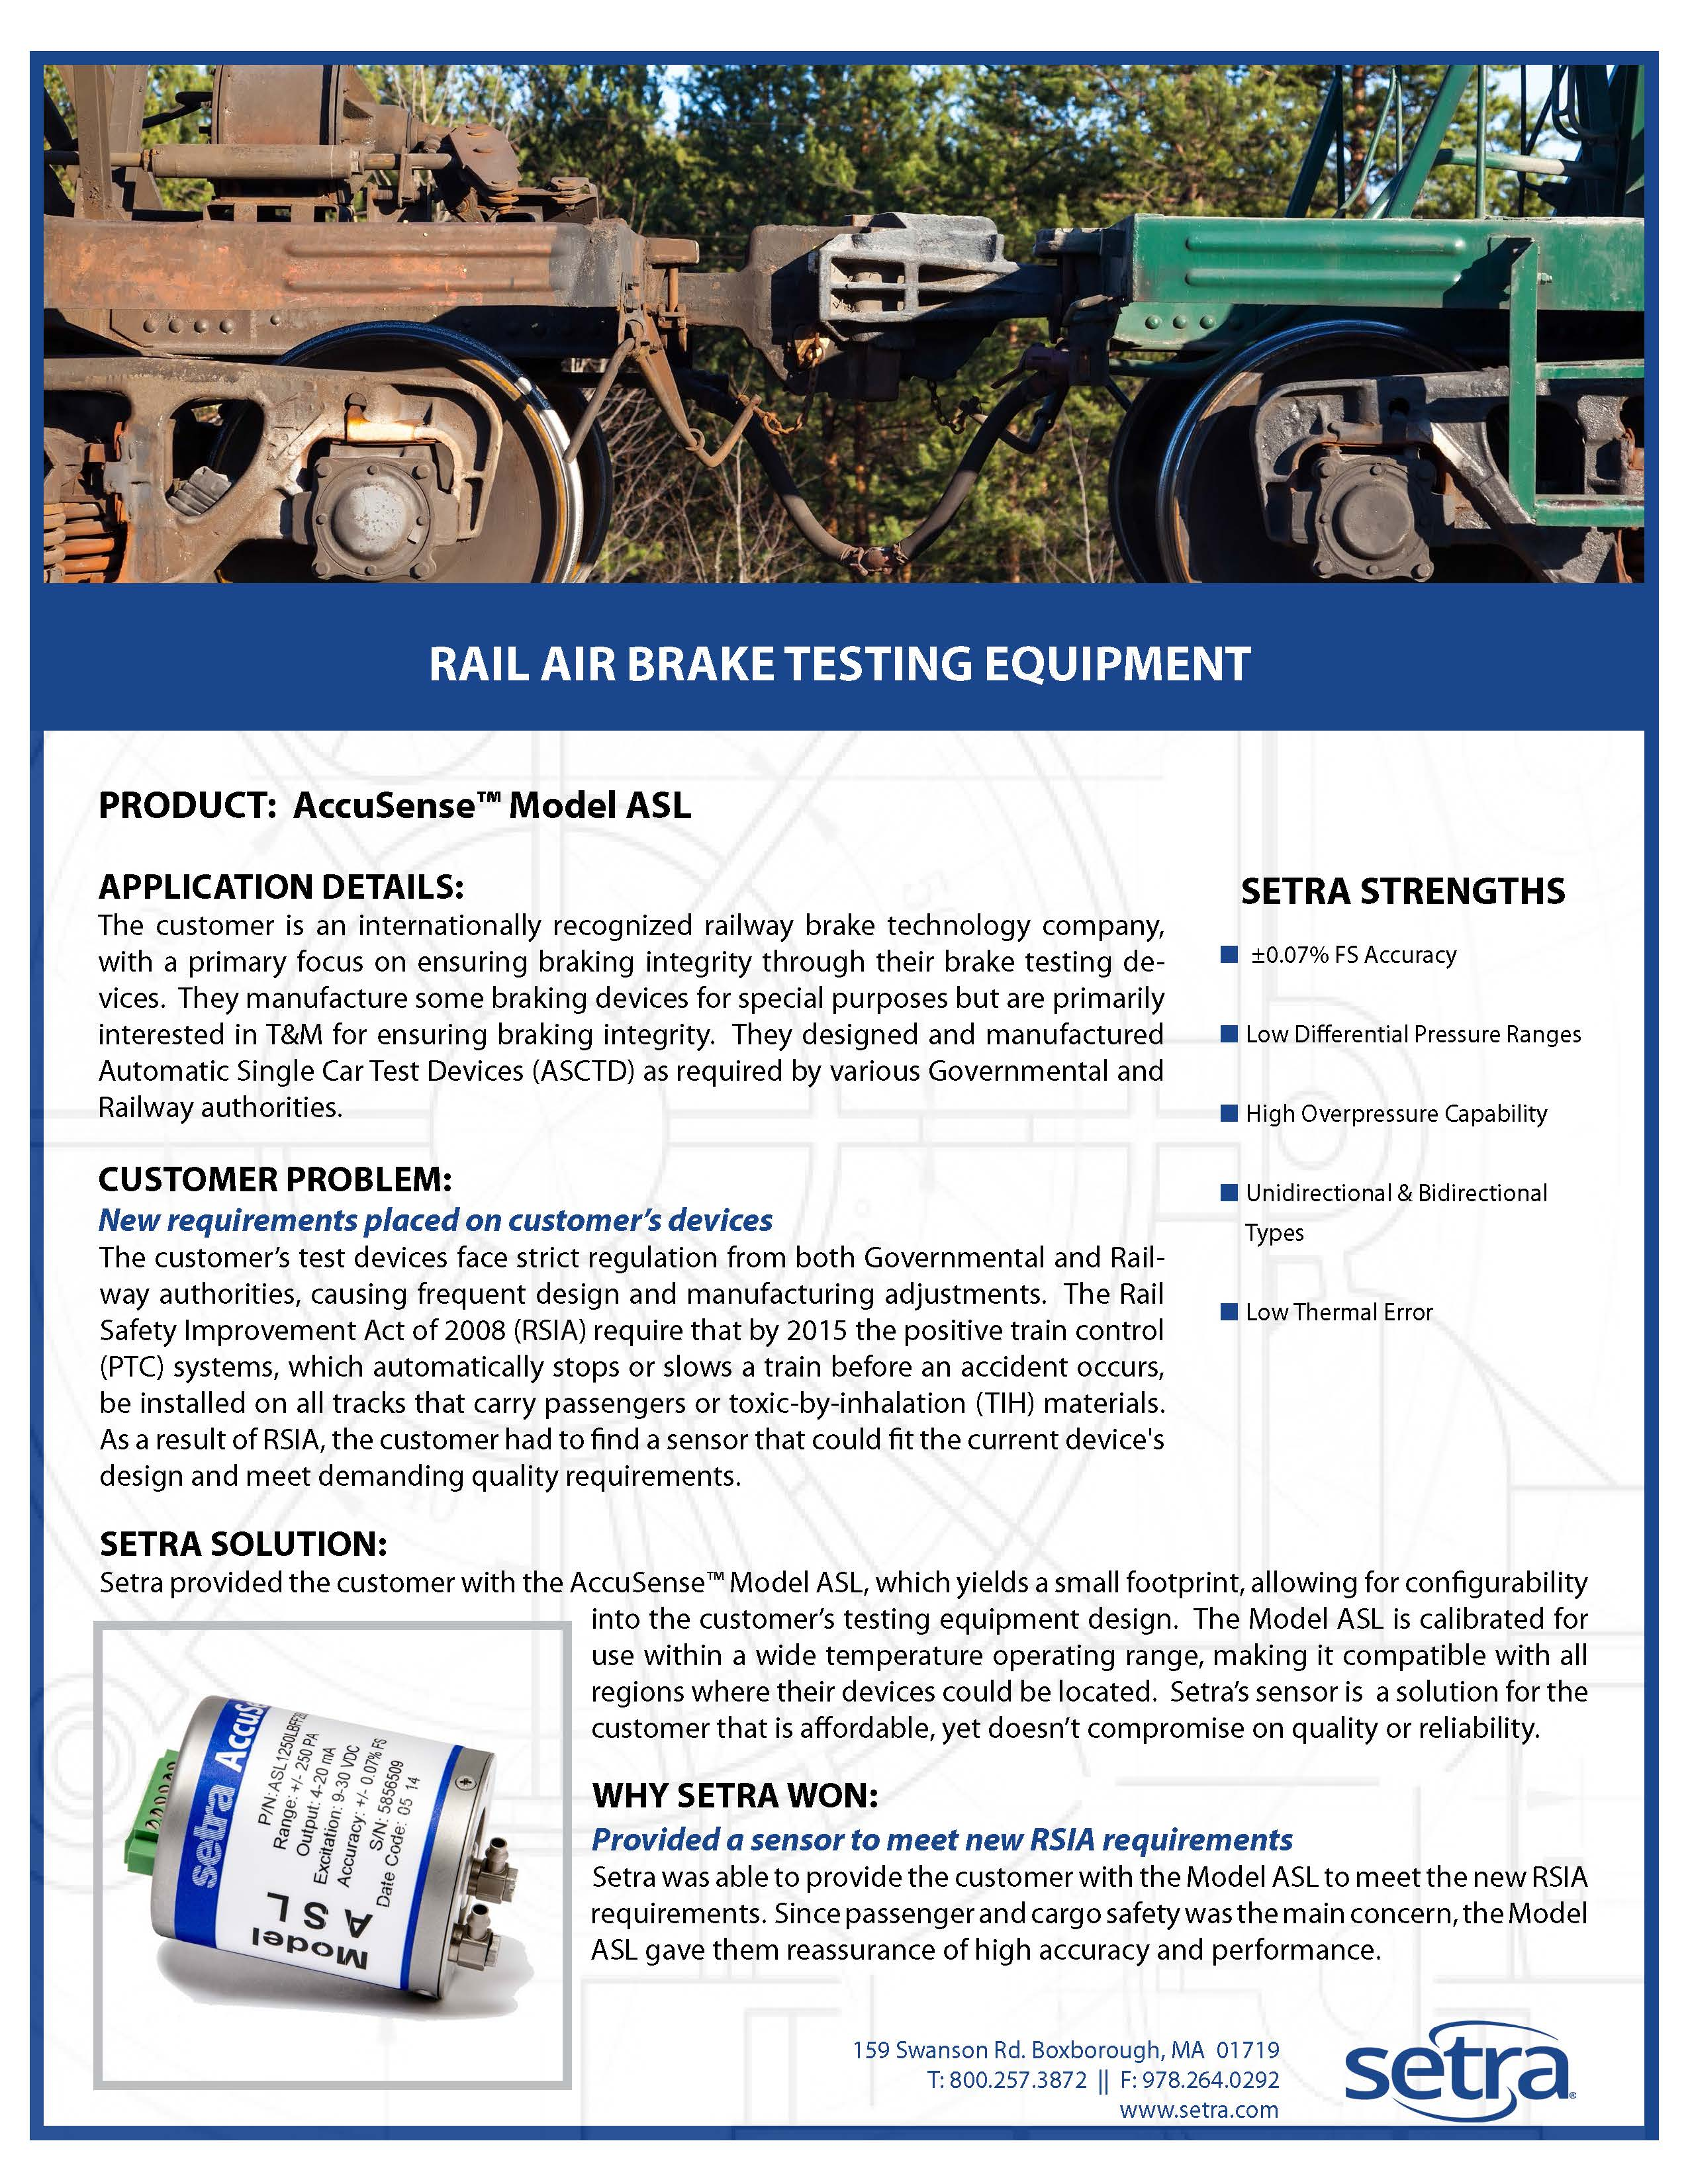 setra asl; pressure transducers; automotive; railway; brake testing; pressure sensing